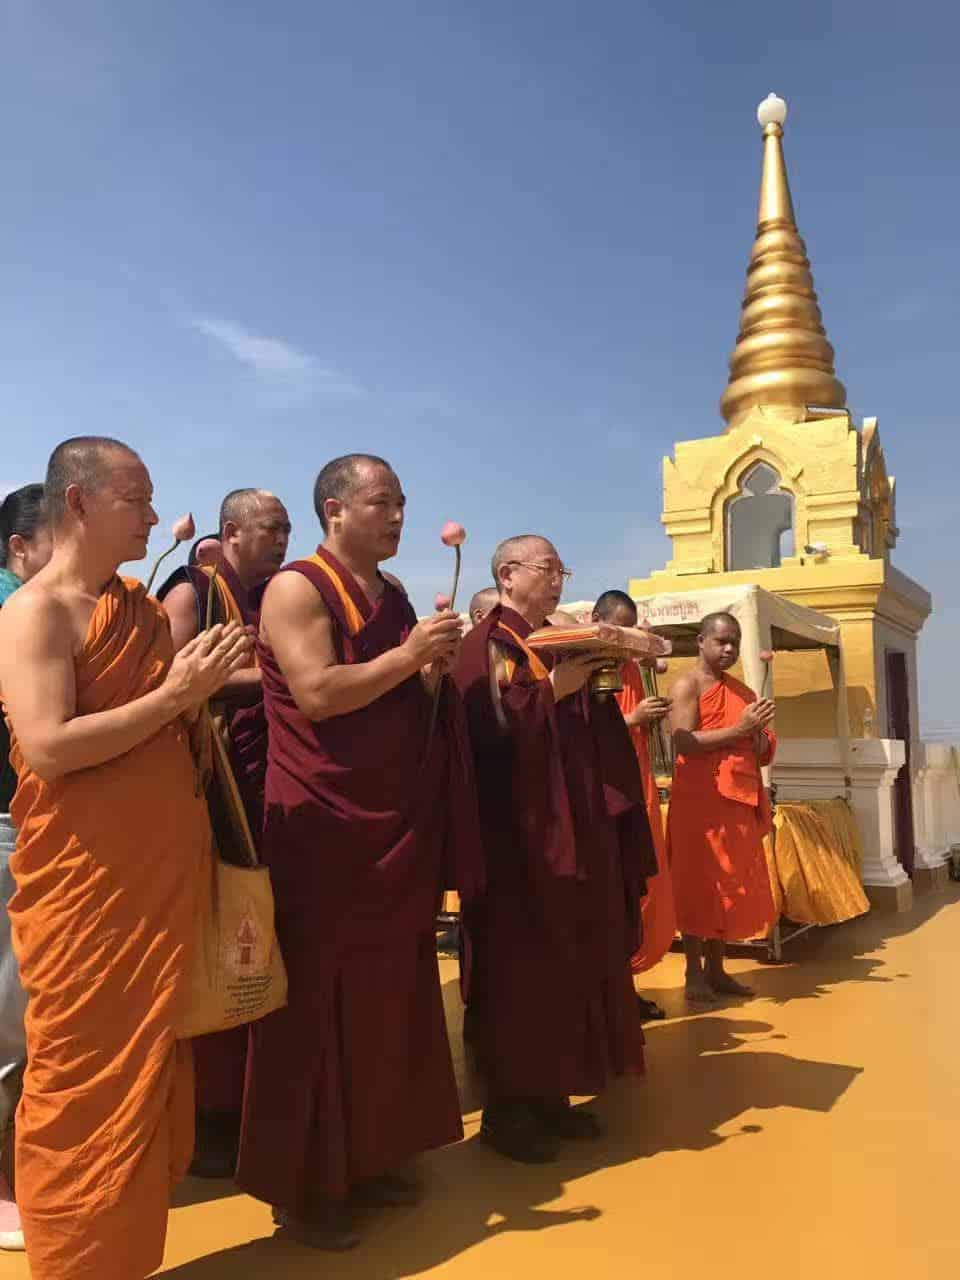 Gosok Rinpoche Thailand 2017 T027 fd01f93e73f3fd4f2b716cc5d6cace1